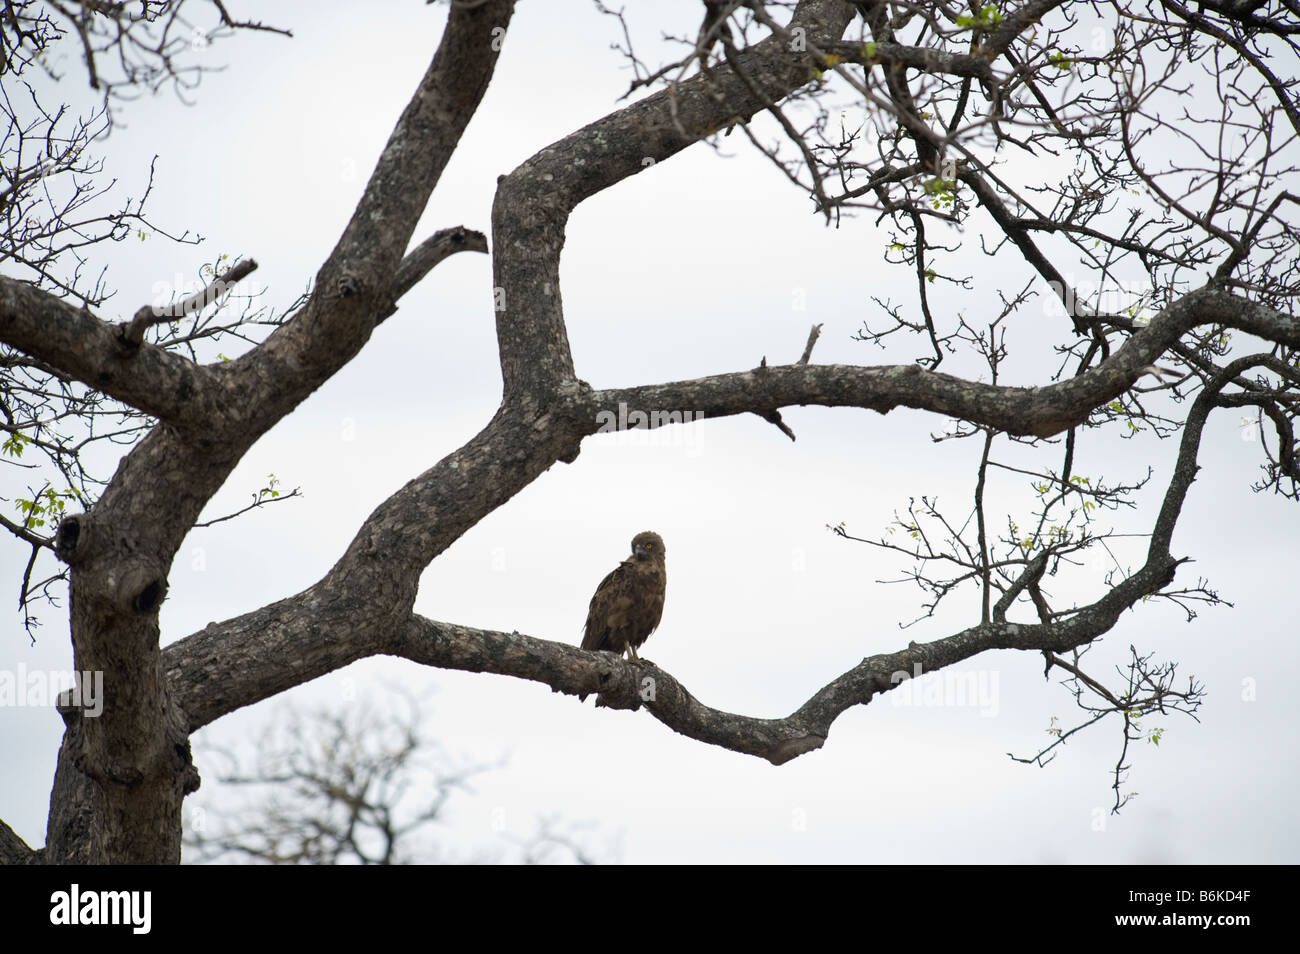 Braune Schlange-Adler Schlange Adler sitzend auf AST Baum Südafrika Krüger Krüger NP Nationalpark Stockbild